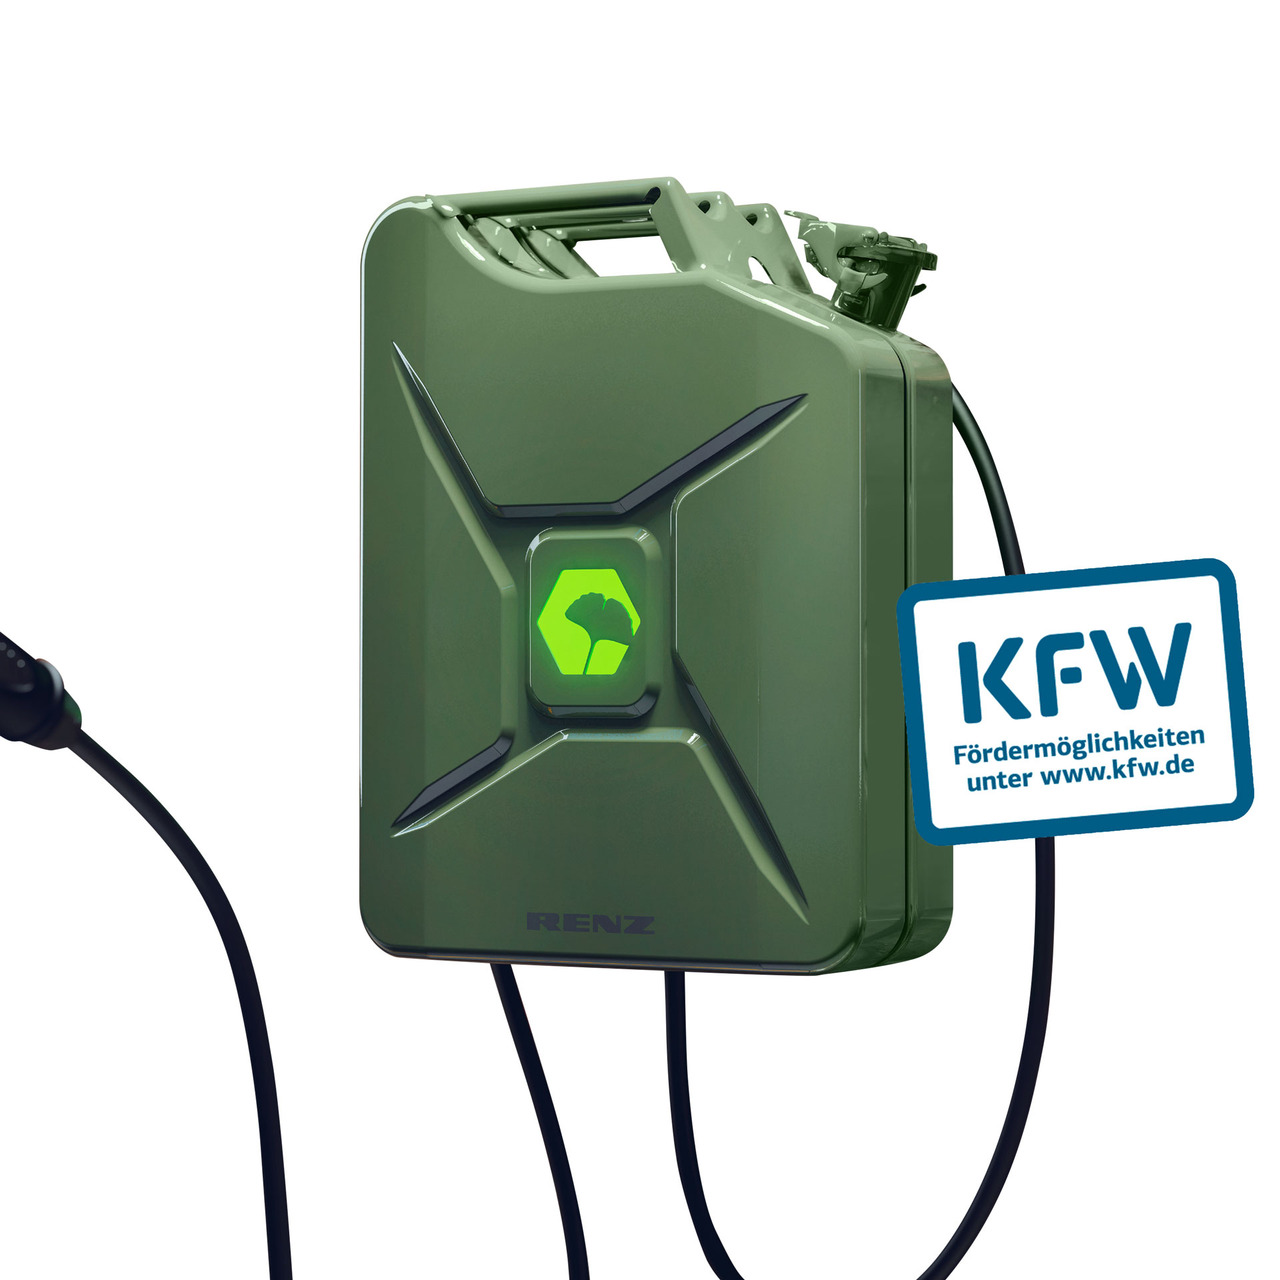 Renz Wallbox POWER2CAR FUEL olive- 3-7 - 11 kW- 5-m-Kabel- förderfähig